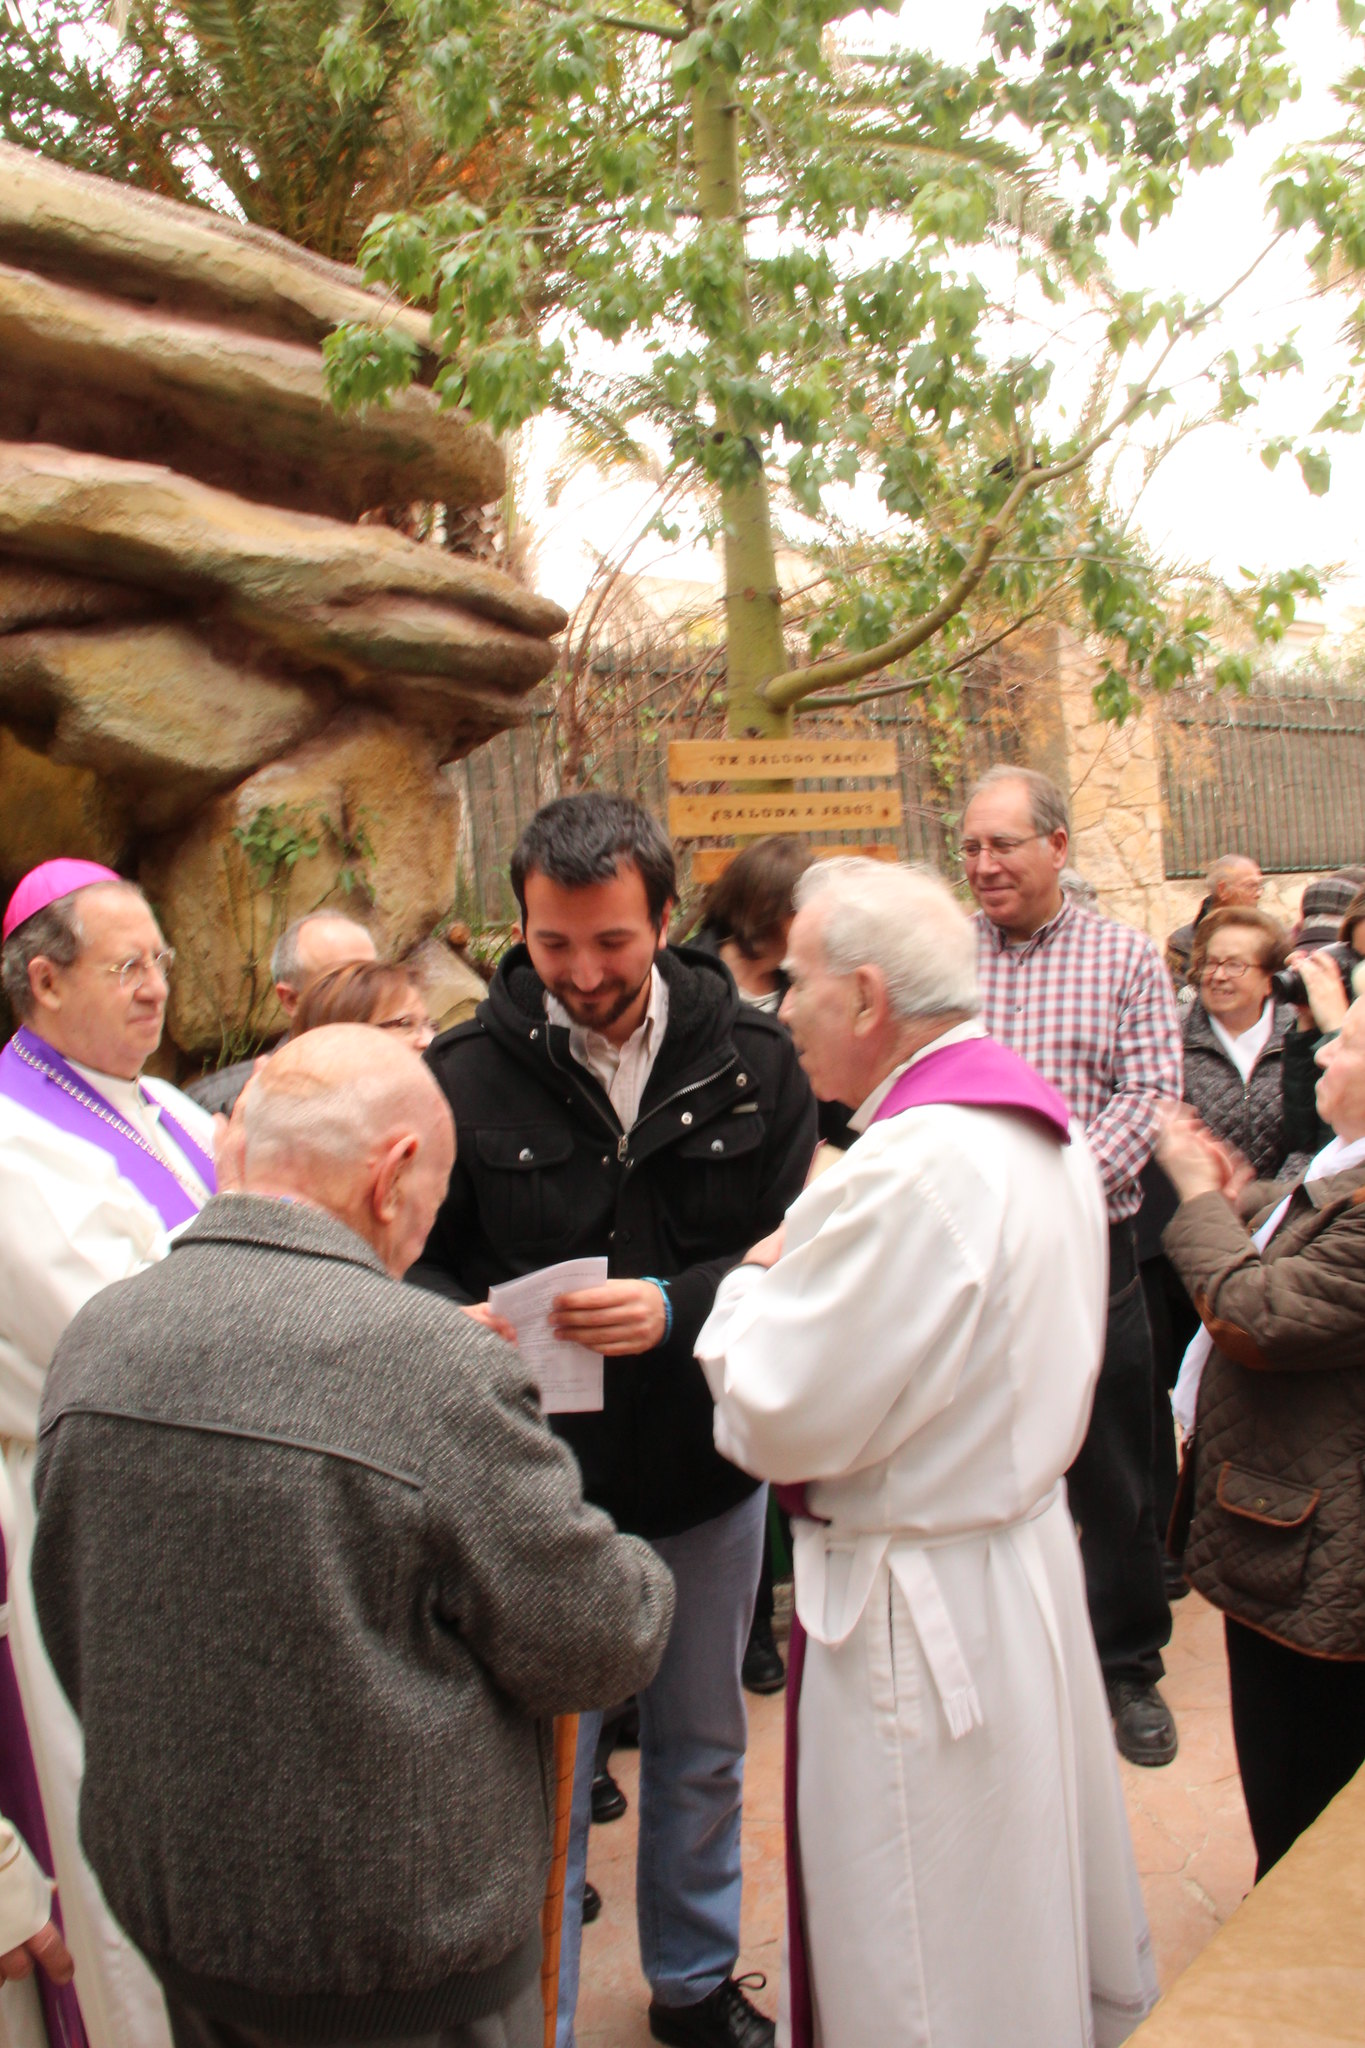 (2016-02-13) - Inauguración Virgen De Lourdes, La Molineta - Archivo La Molineta (090)